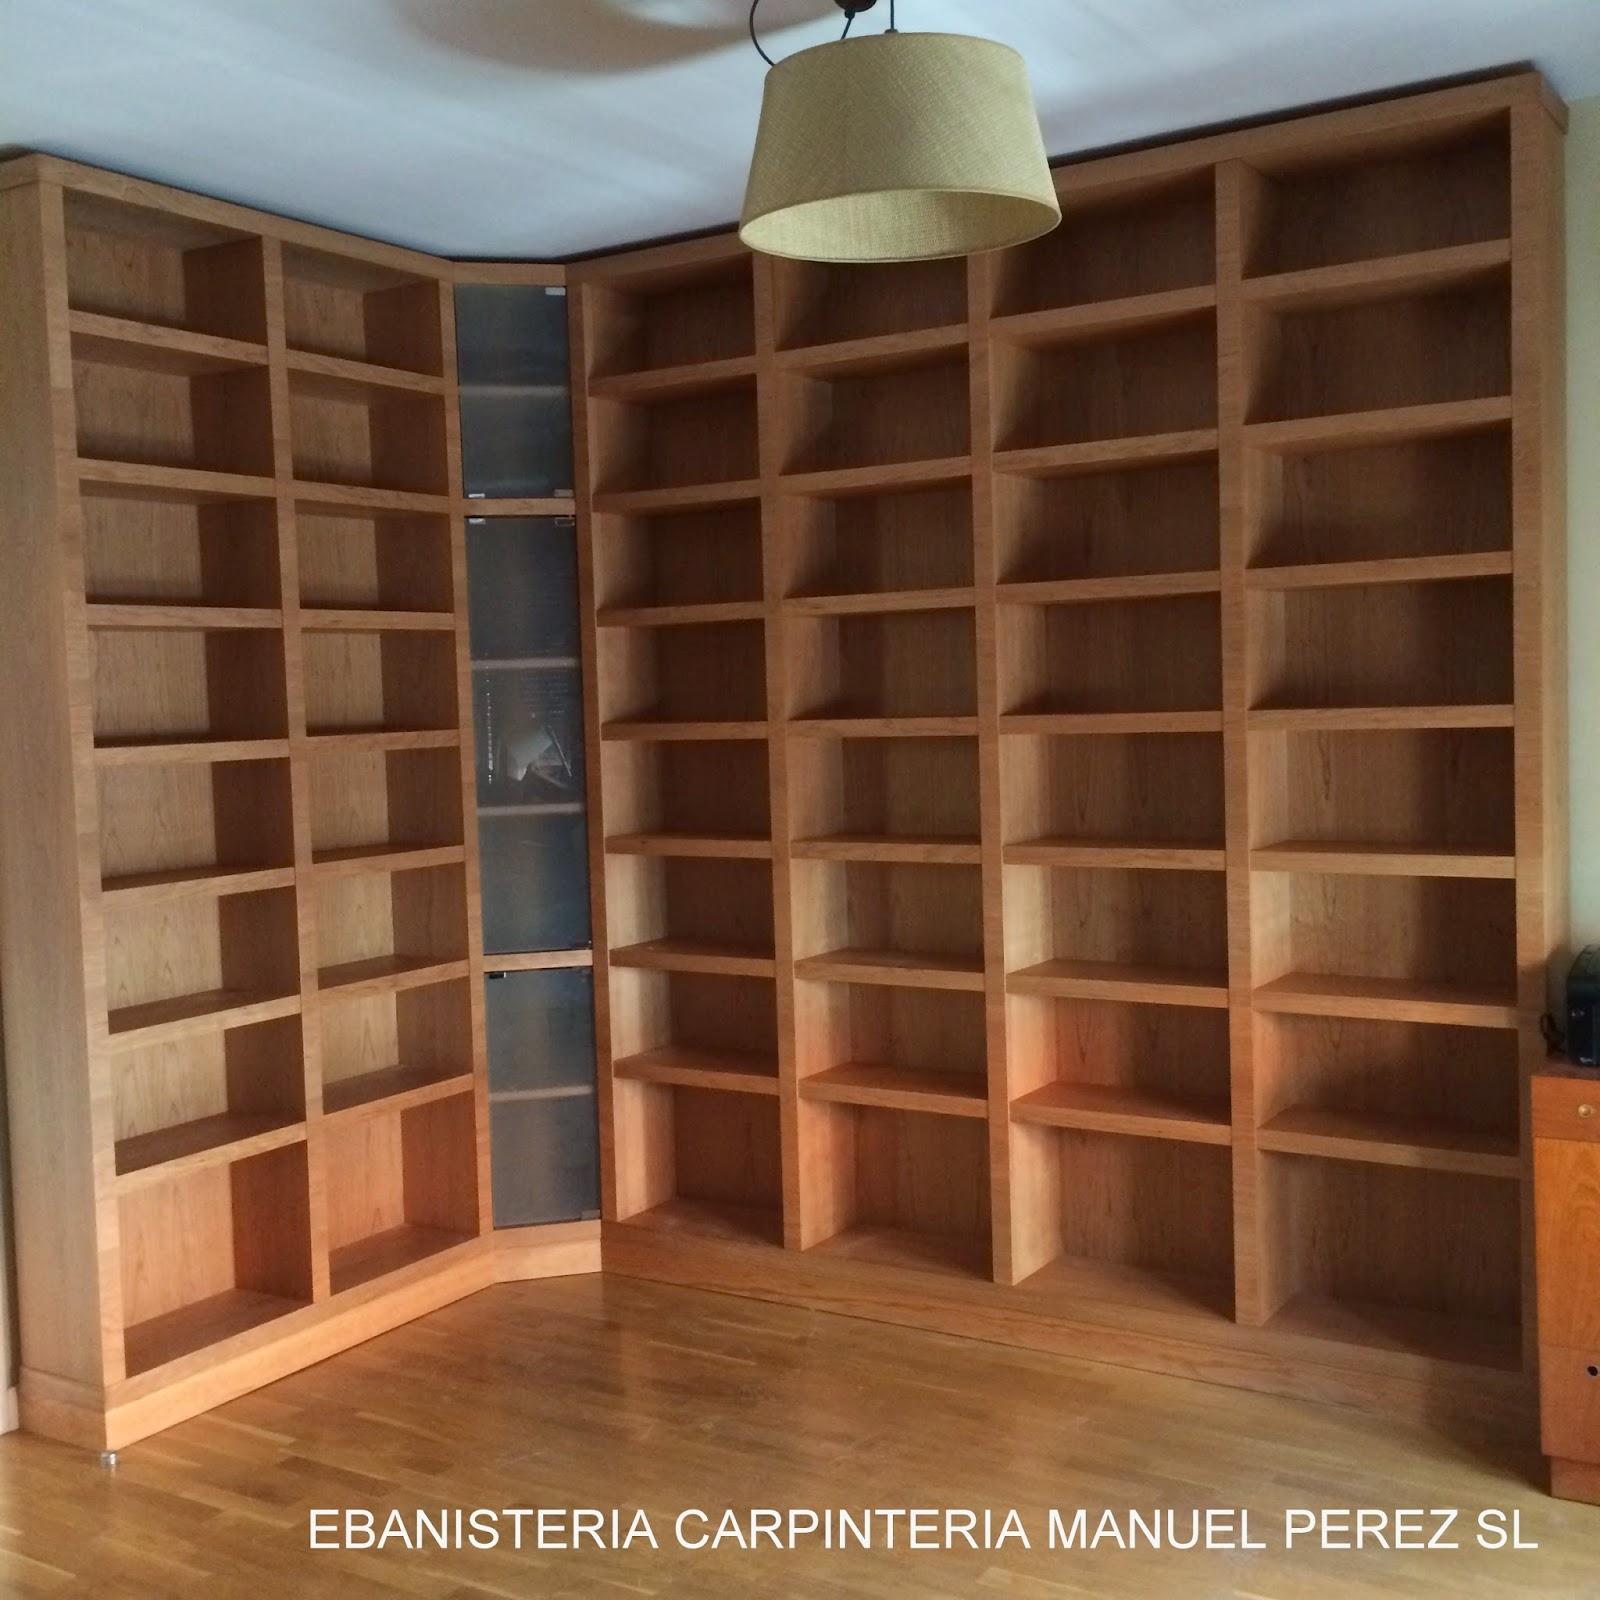 Ebanisteria carpinteria manuel perez zaragoza libreria a medida en madera maciza de cerezo - Estanterias a medida ...